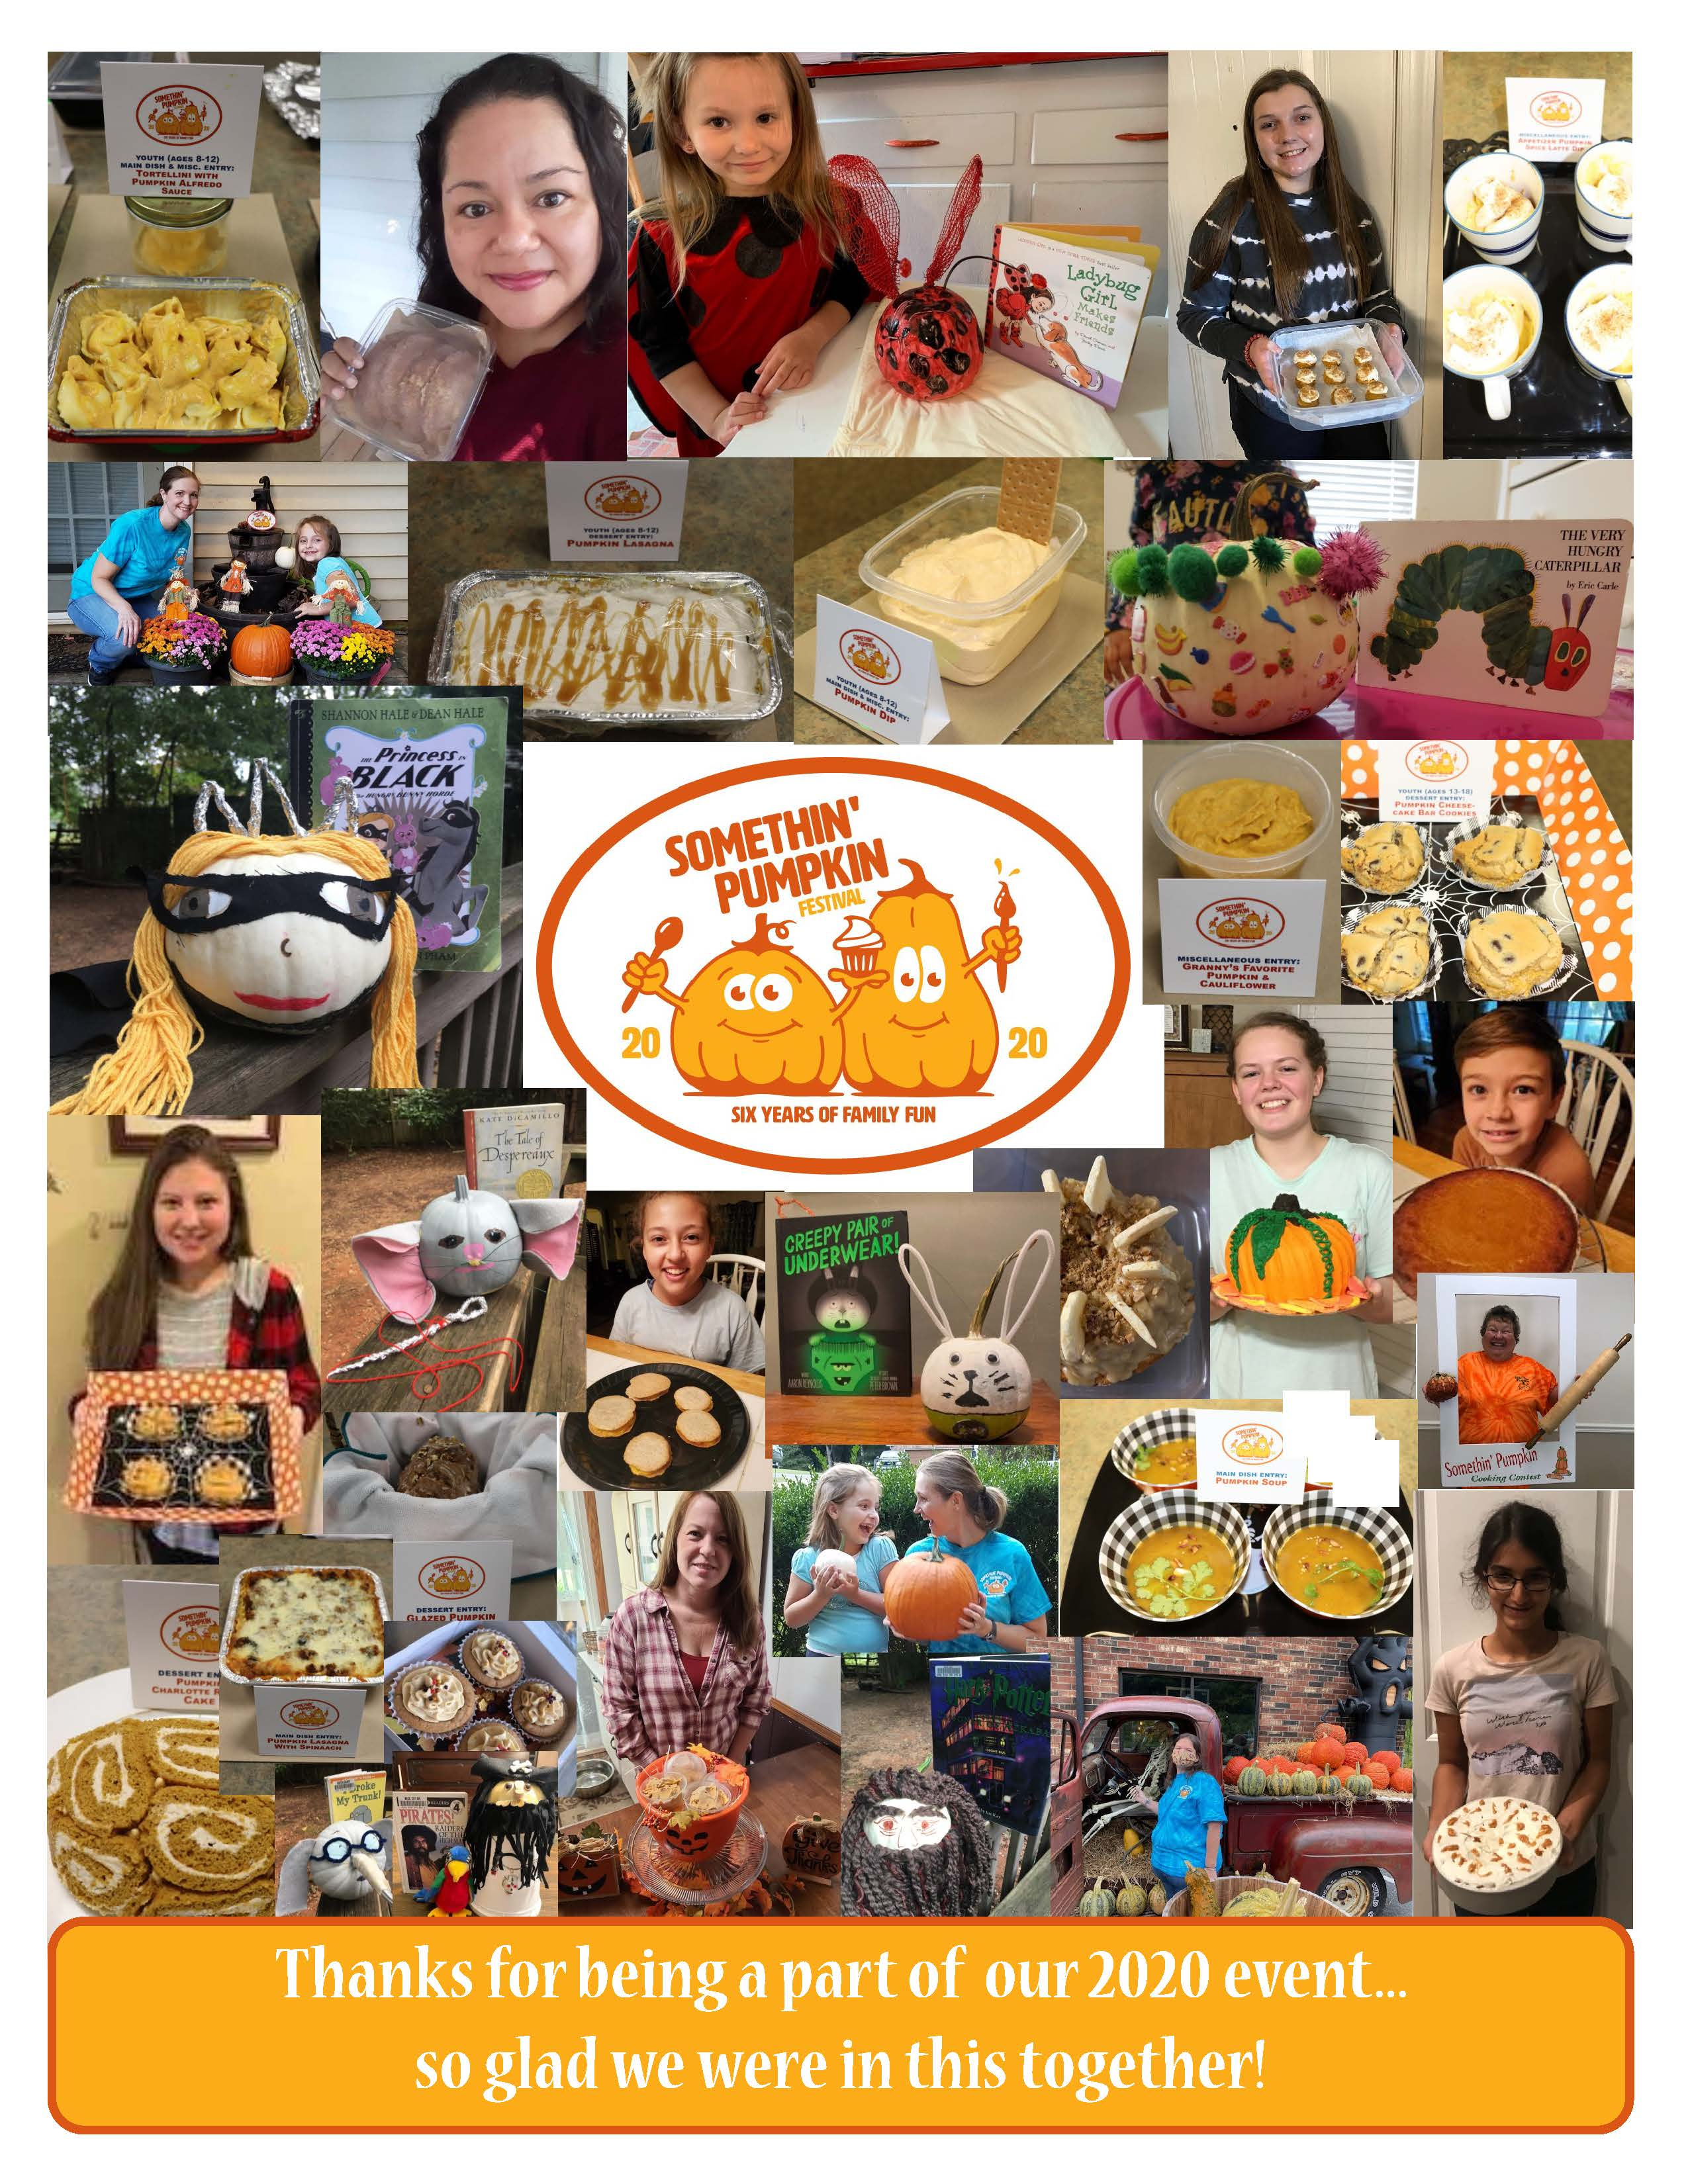 2020 Somethin' Pumpkin Photo Collage